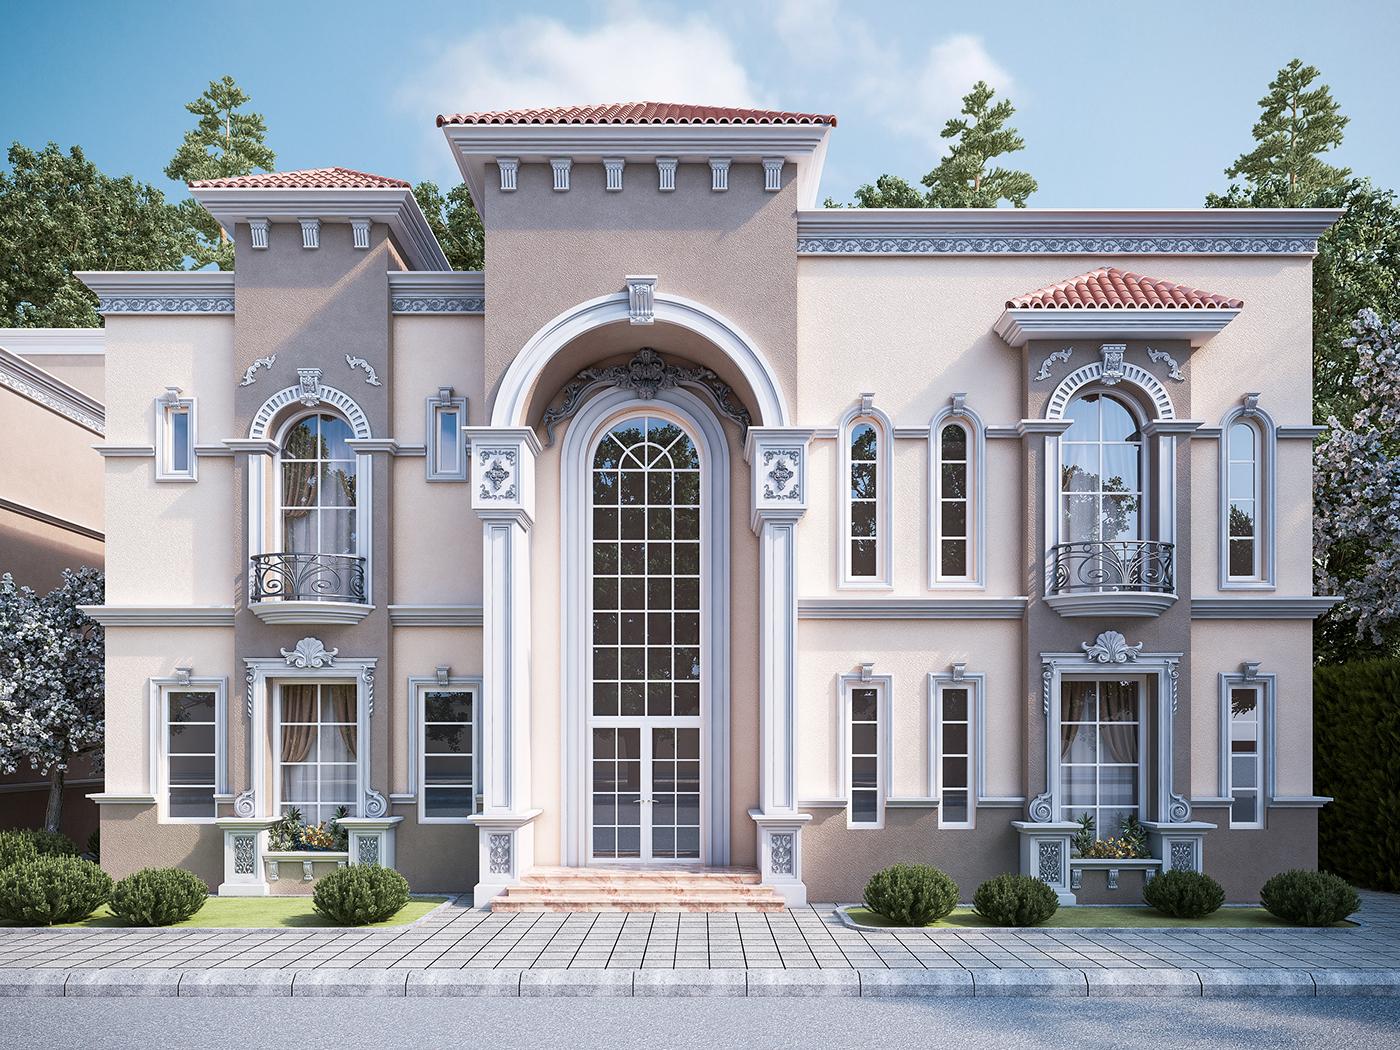 Villas exterior on behance for Villa exterior design gallery